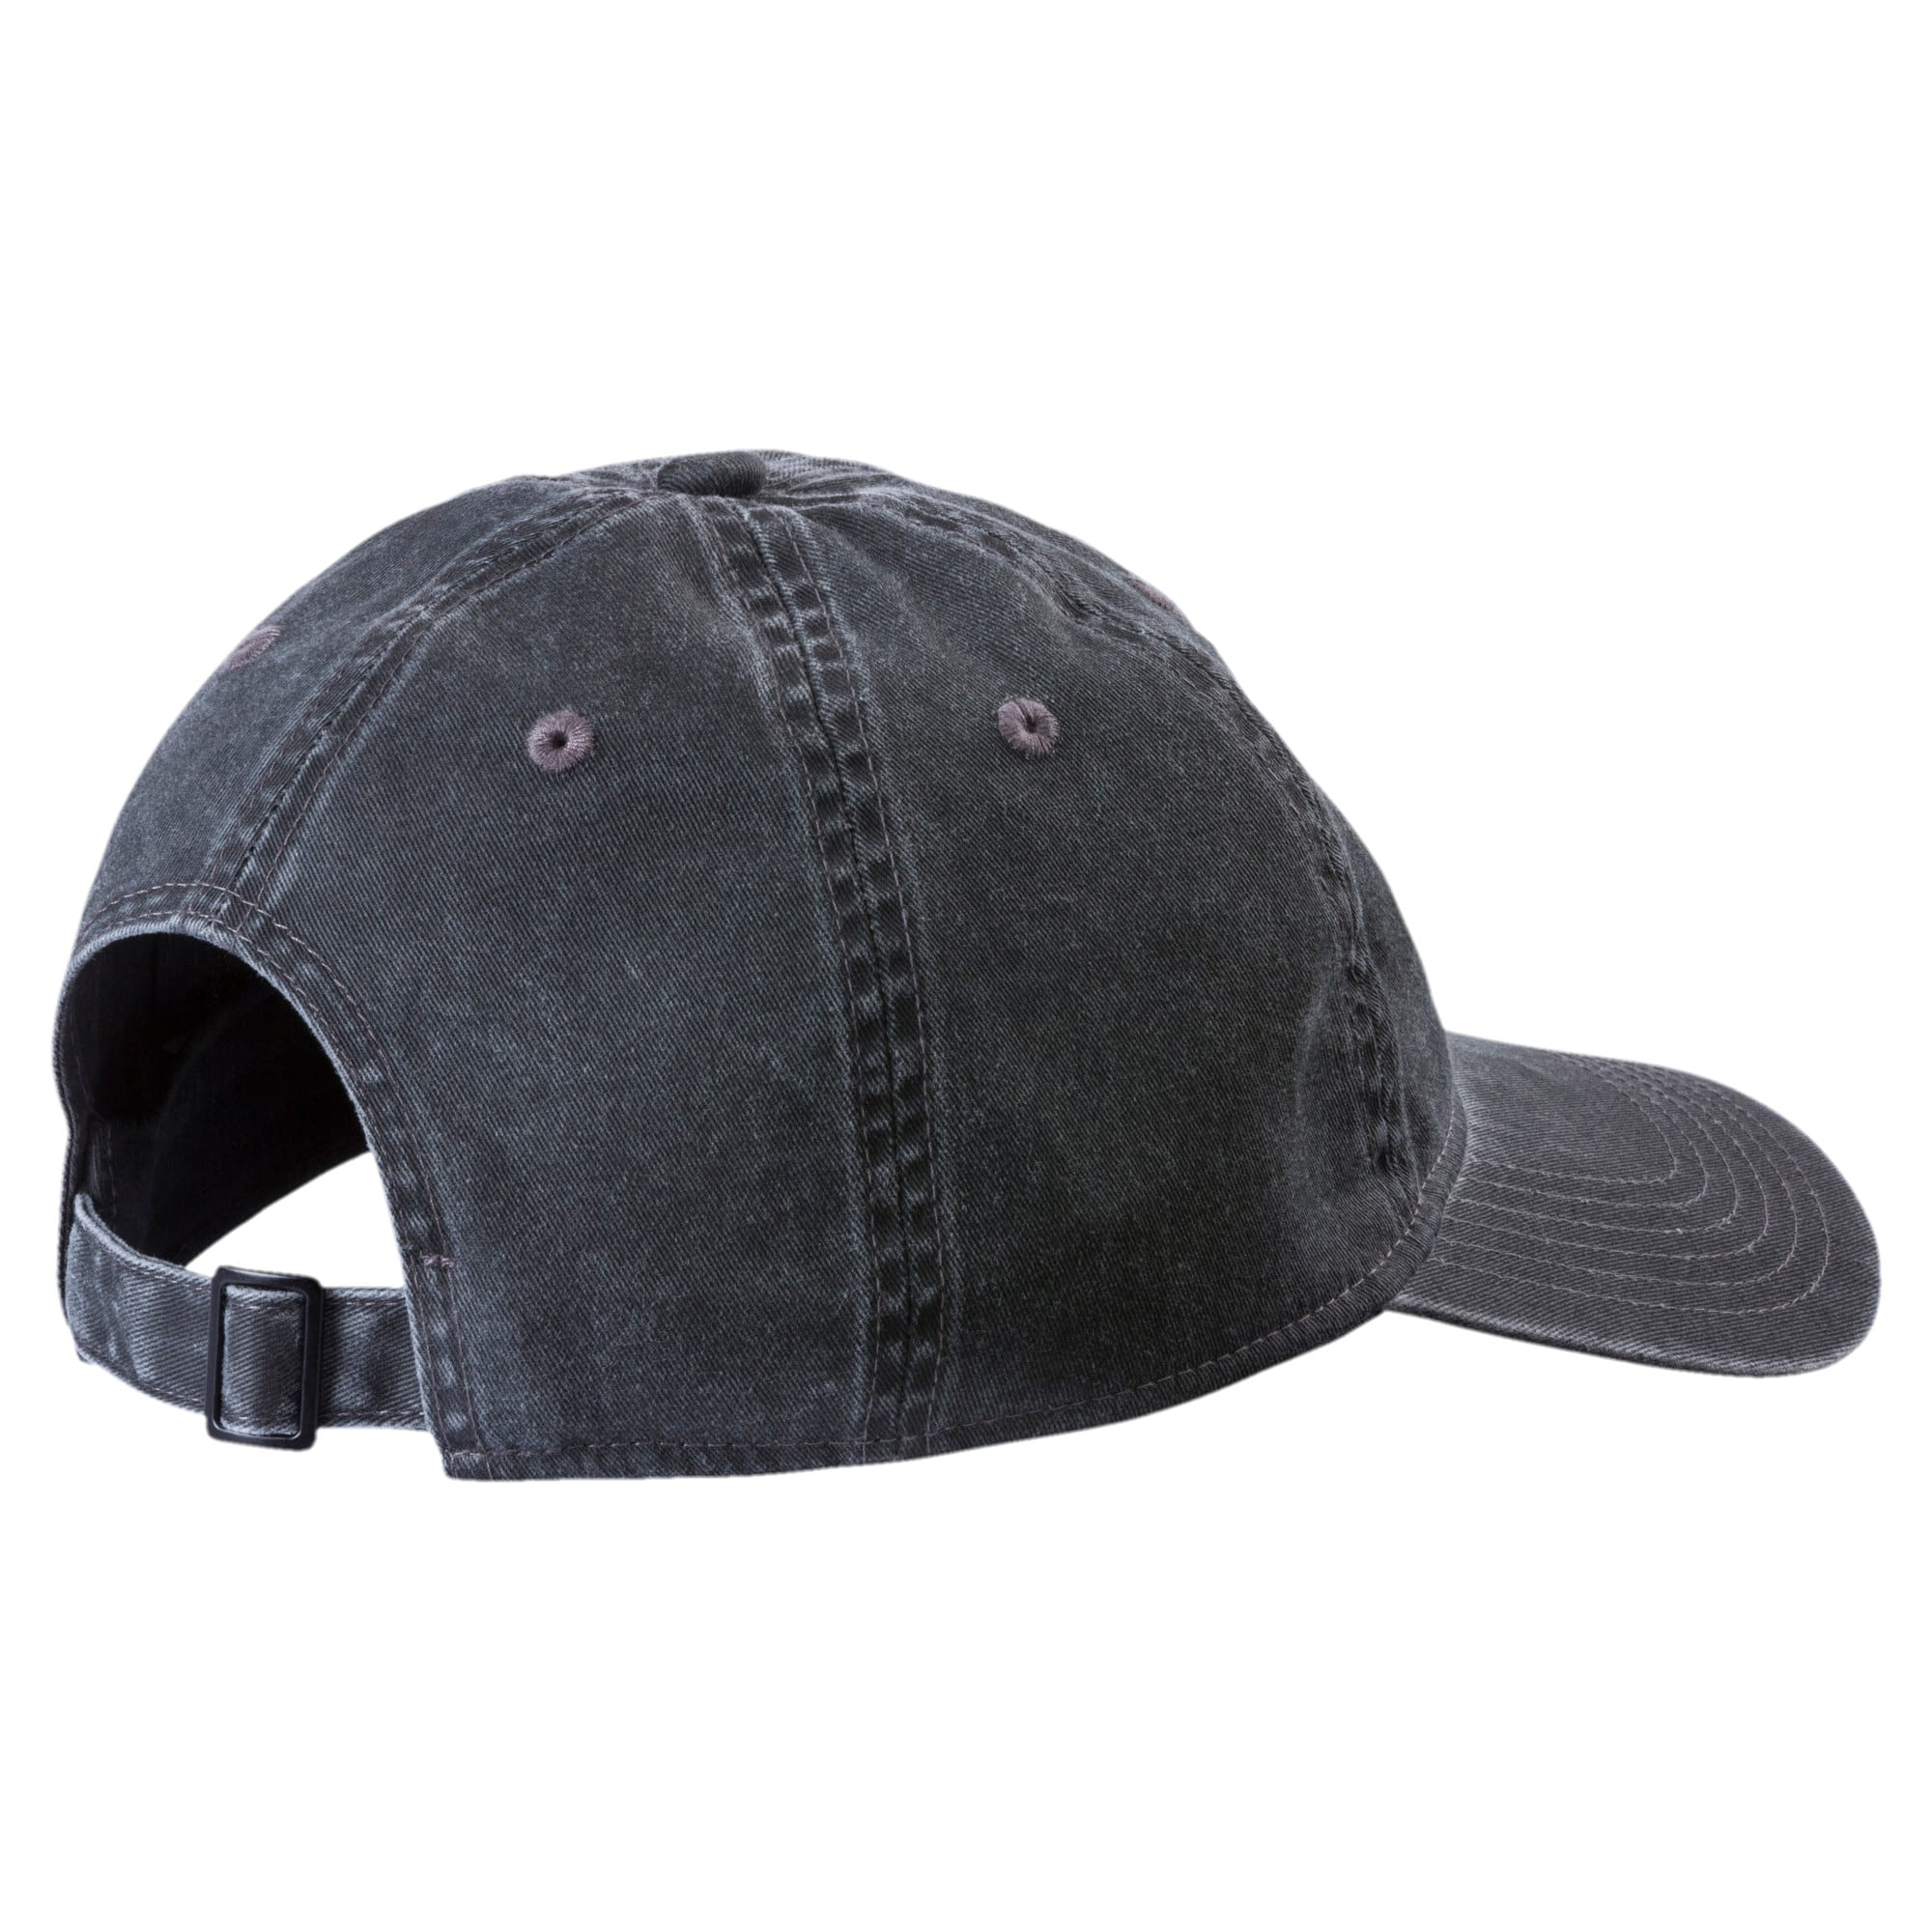 Thumbnail 2 of ARCHIVE BB cap, Puma Black, medium